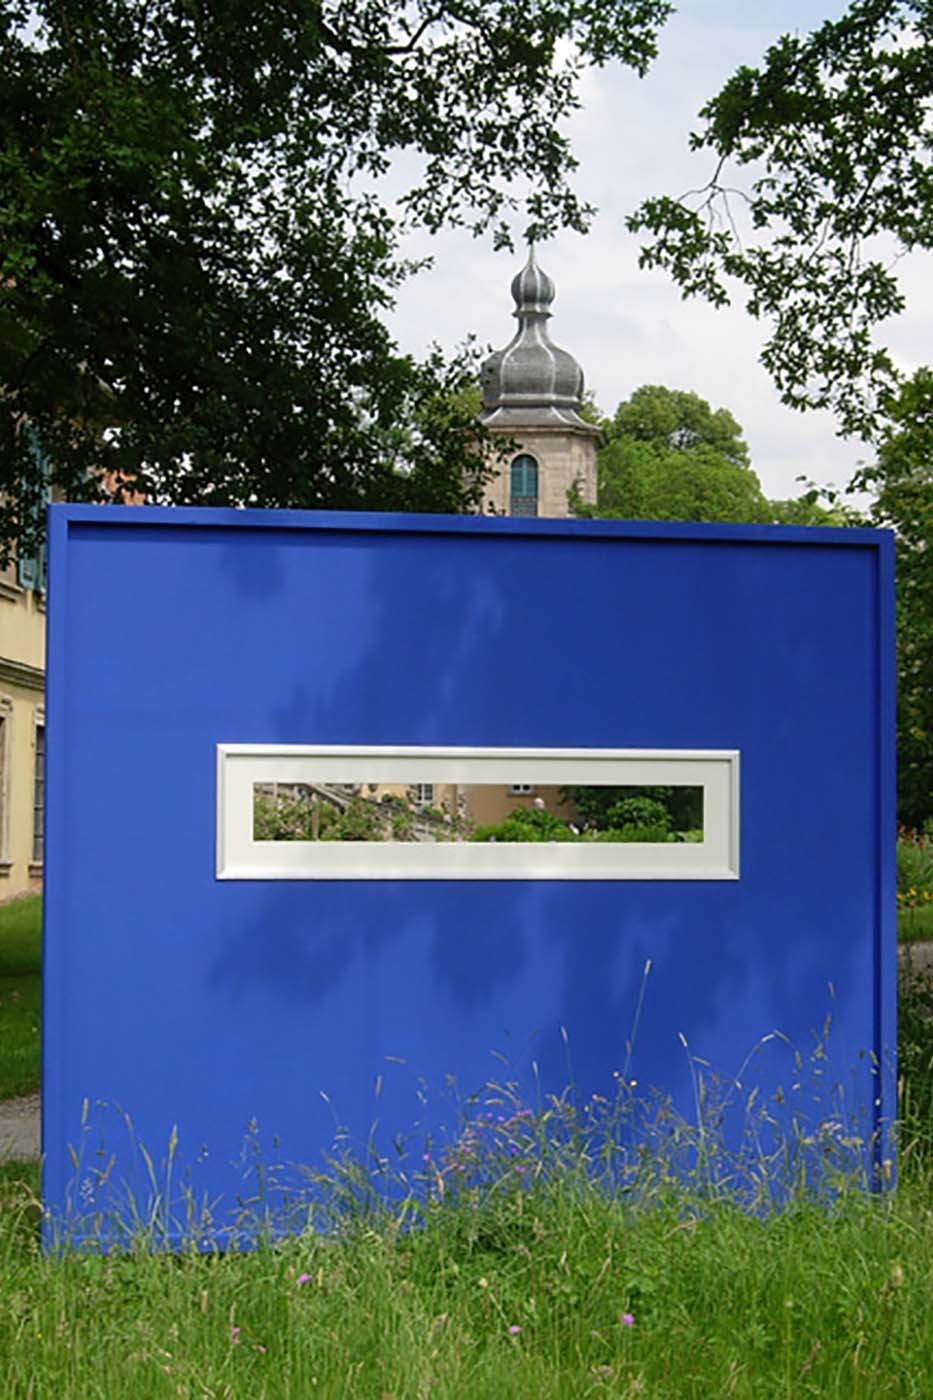 03_Ansicht blau, Schloss Fasanerie [2007]